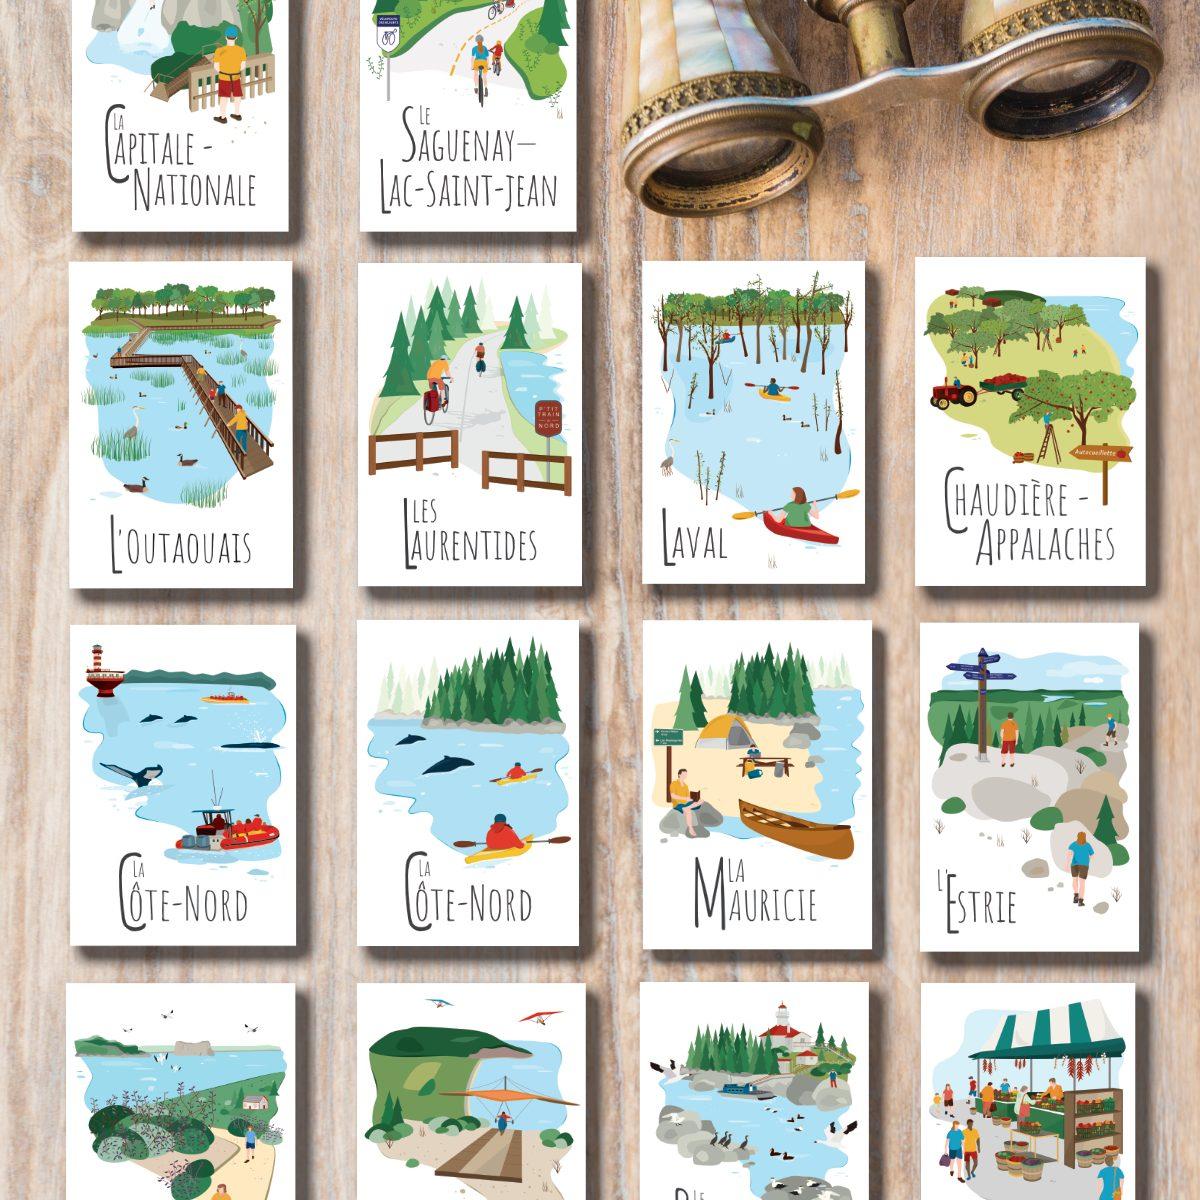 Mailys ORY - Graphiste   Illustration - Cartes postale Le Québec